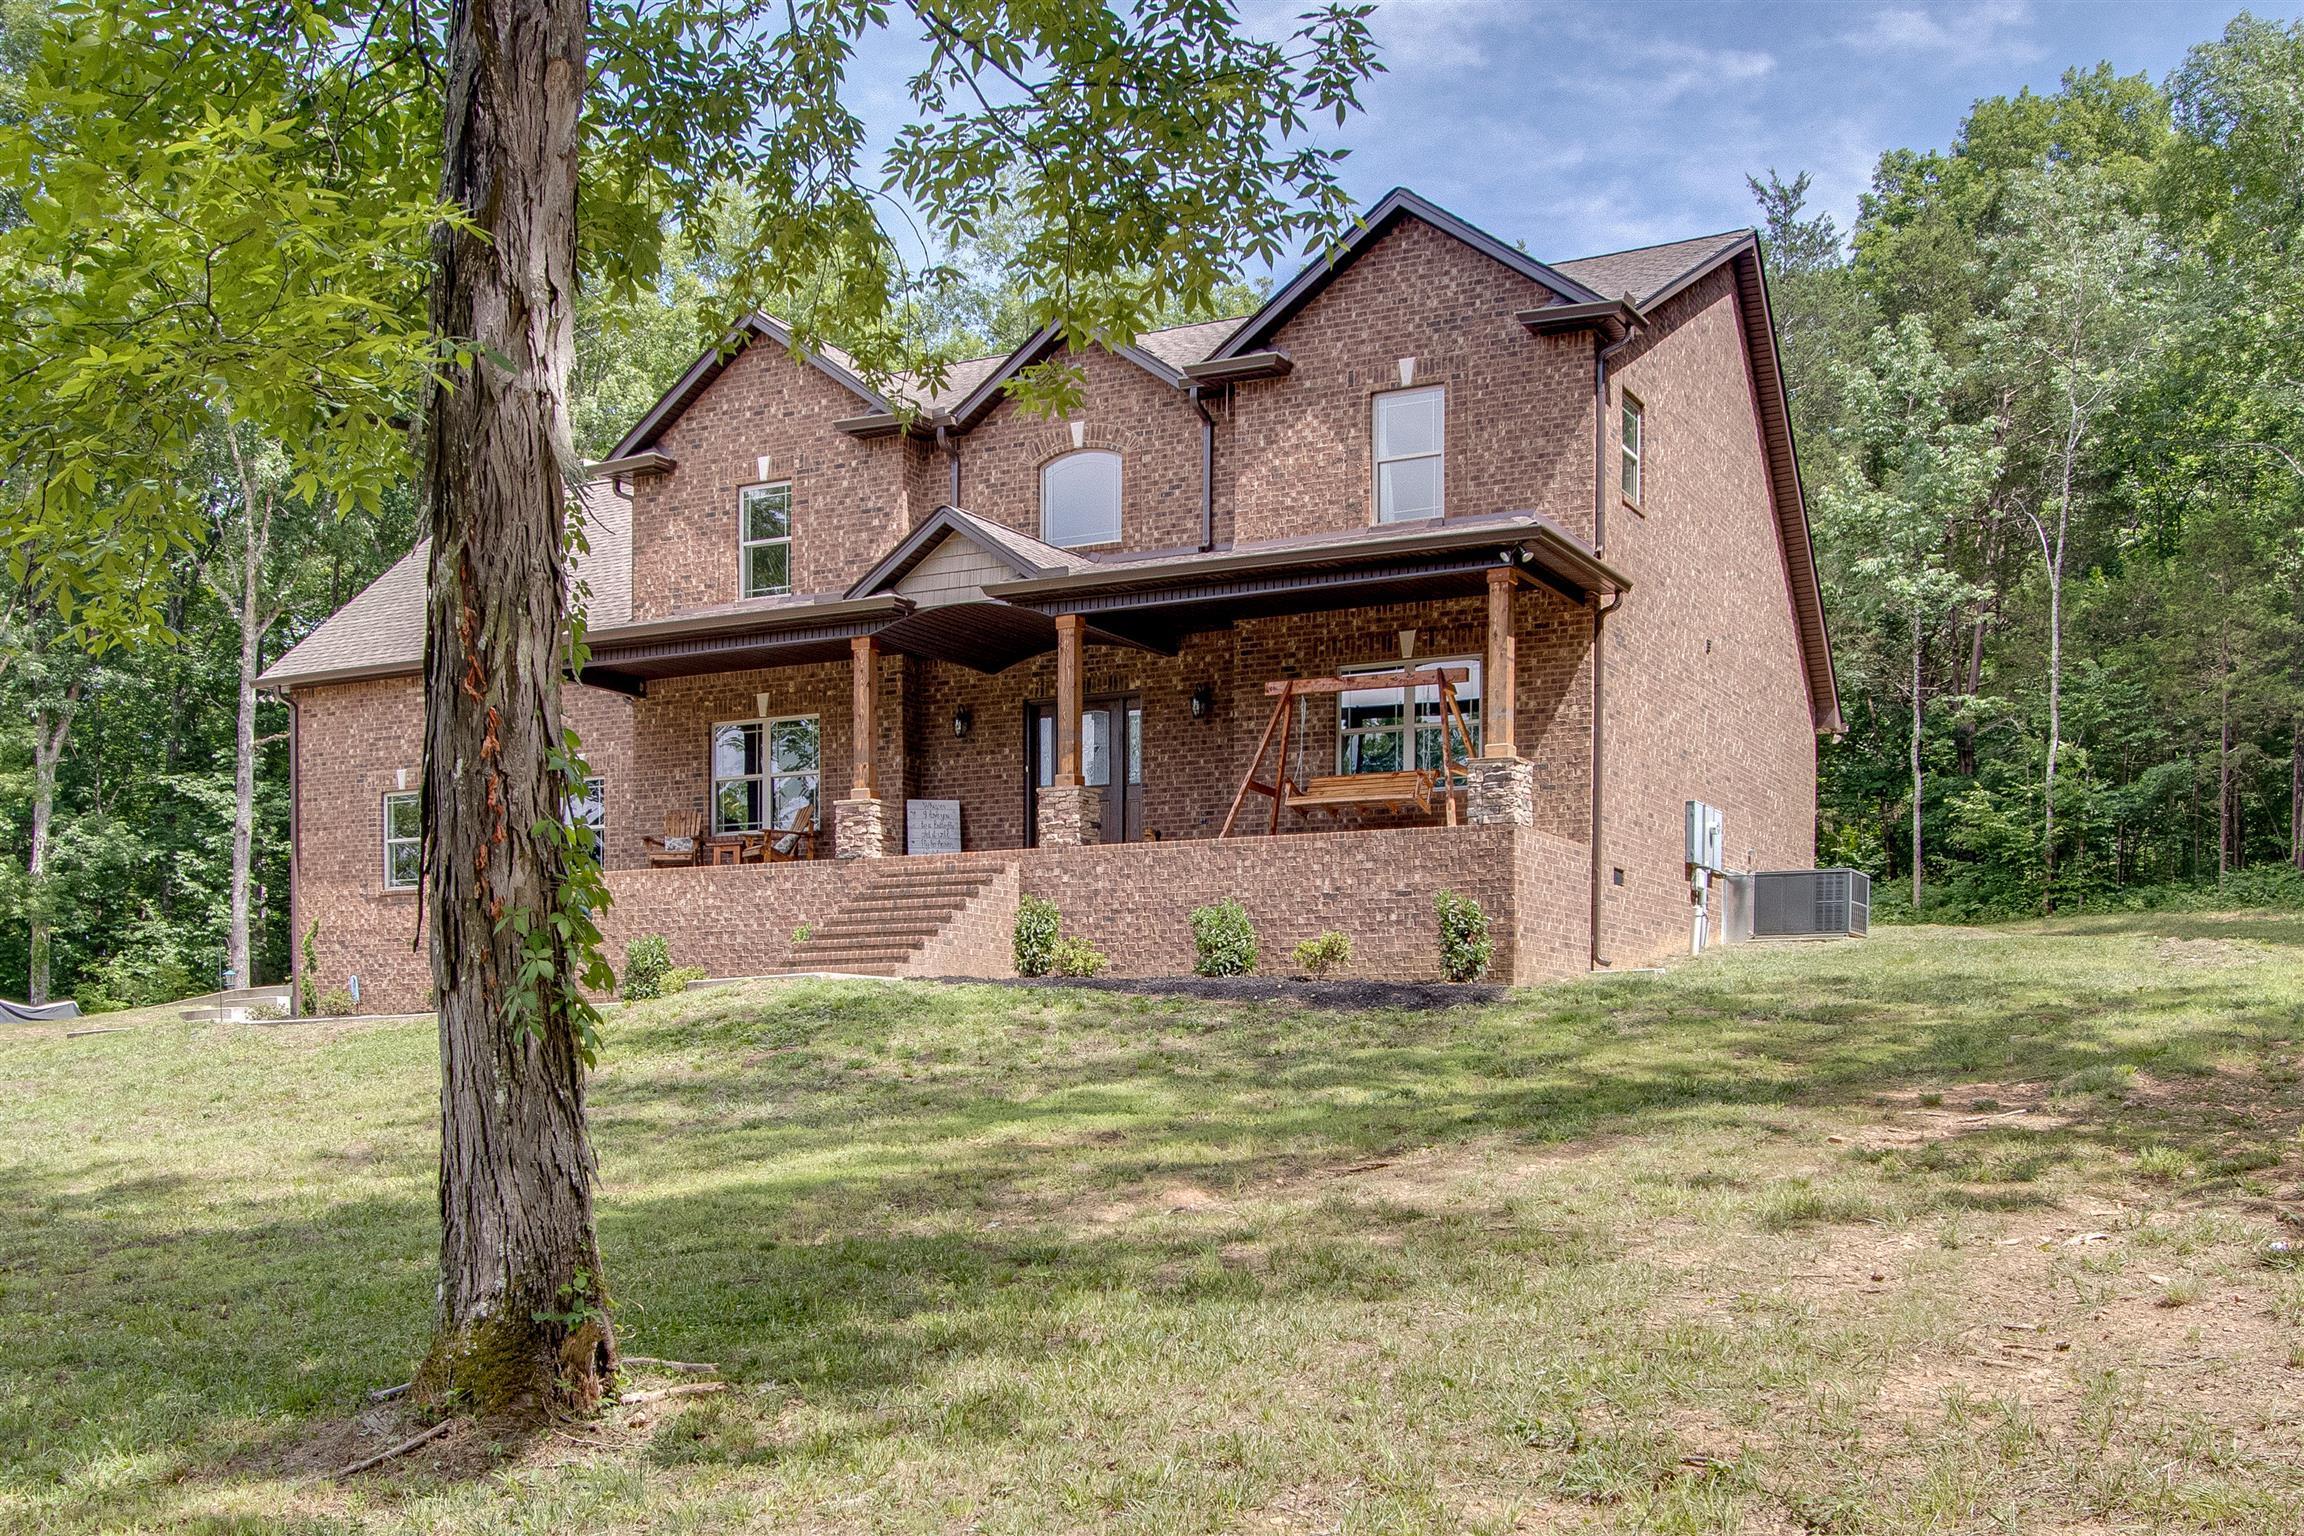 1706 Mires Rd, Mount Juliet, TN 37122 - Mount Juliet, TN real estate listing